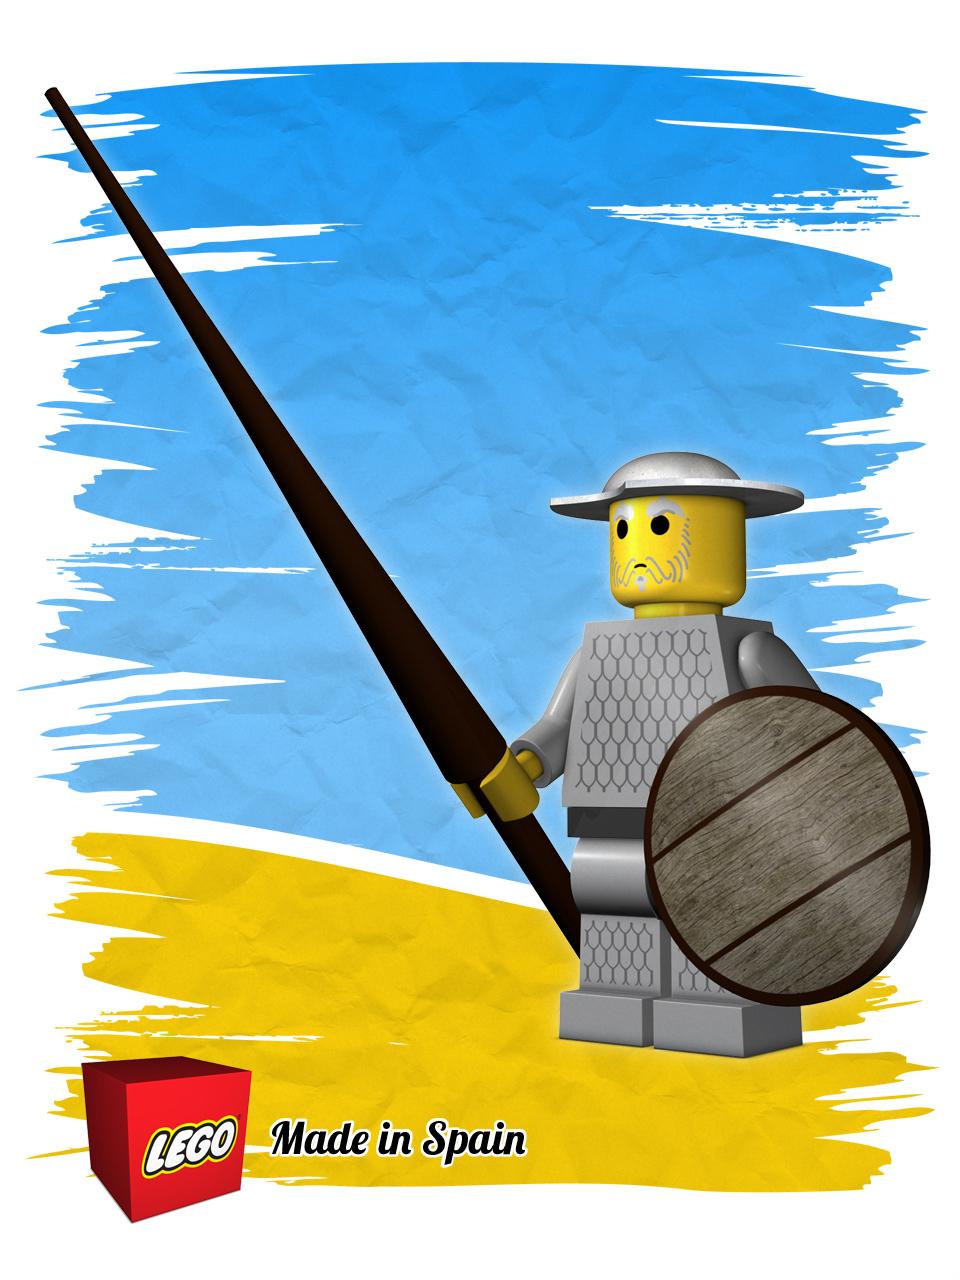 Andrewpyott lego made in spain q 1 1c7a7f4d e0w6